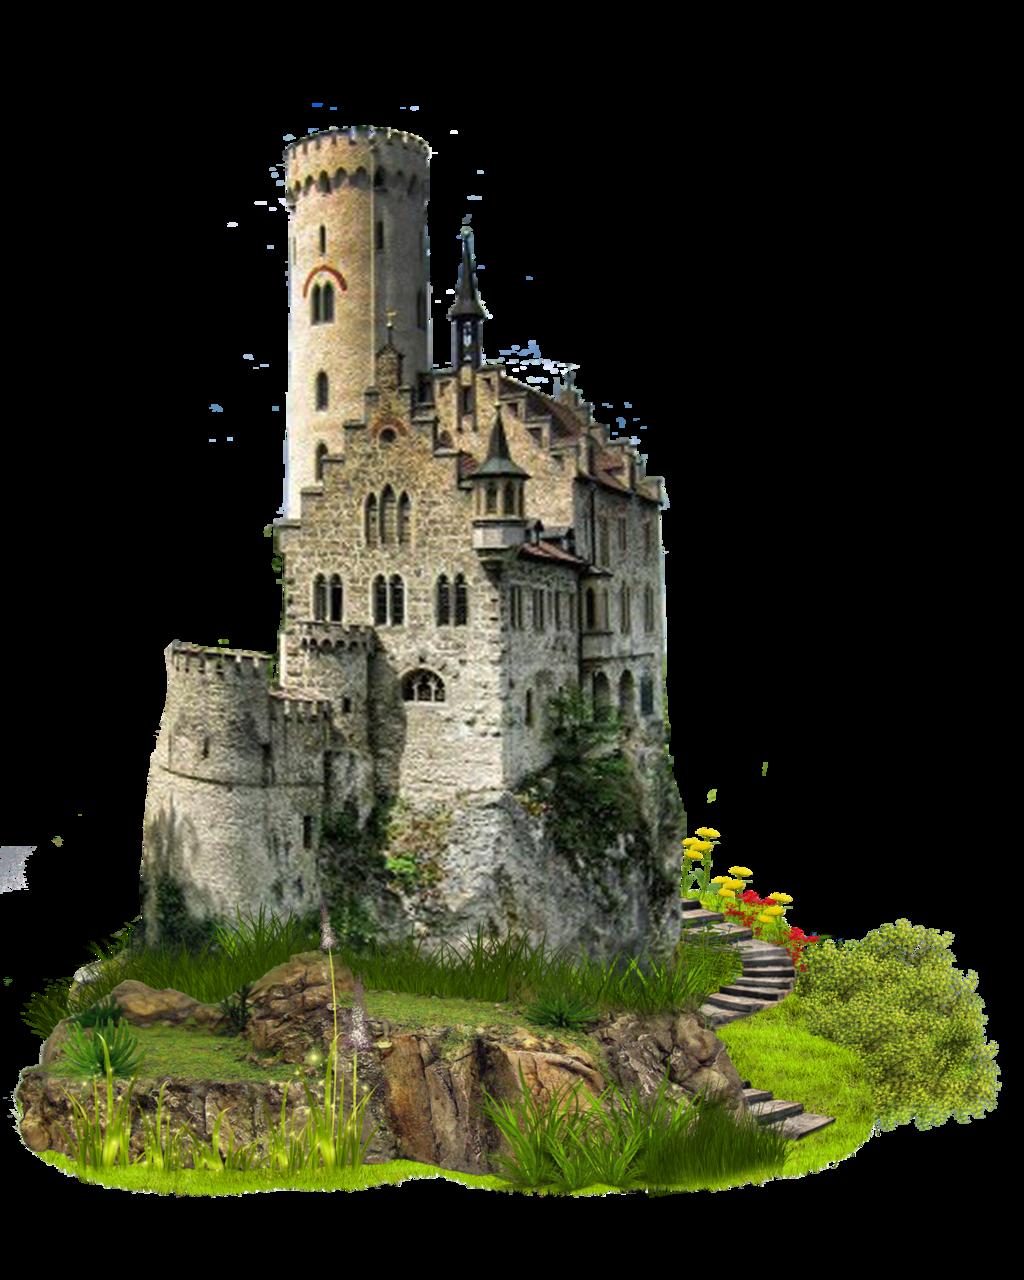 Artist Impression of a Castle PNG Image